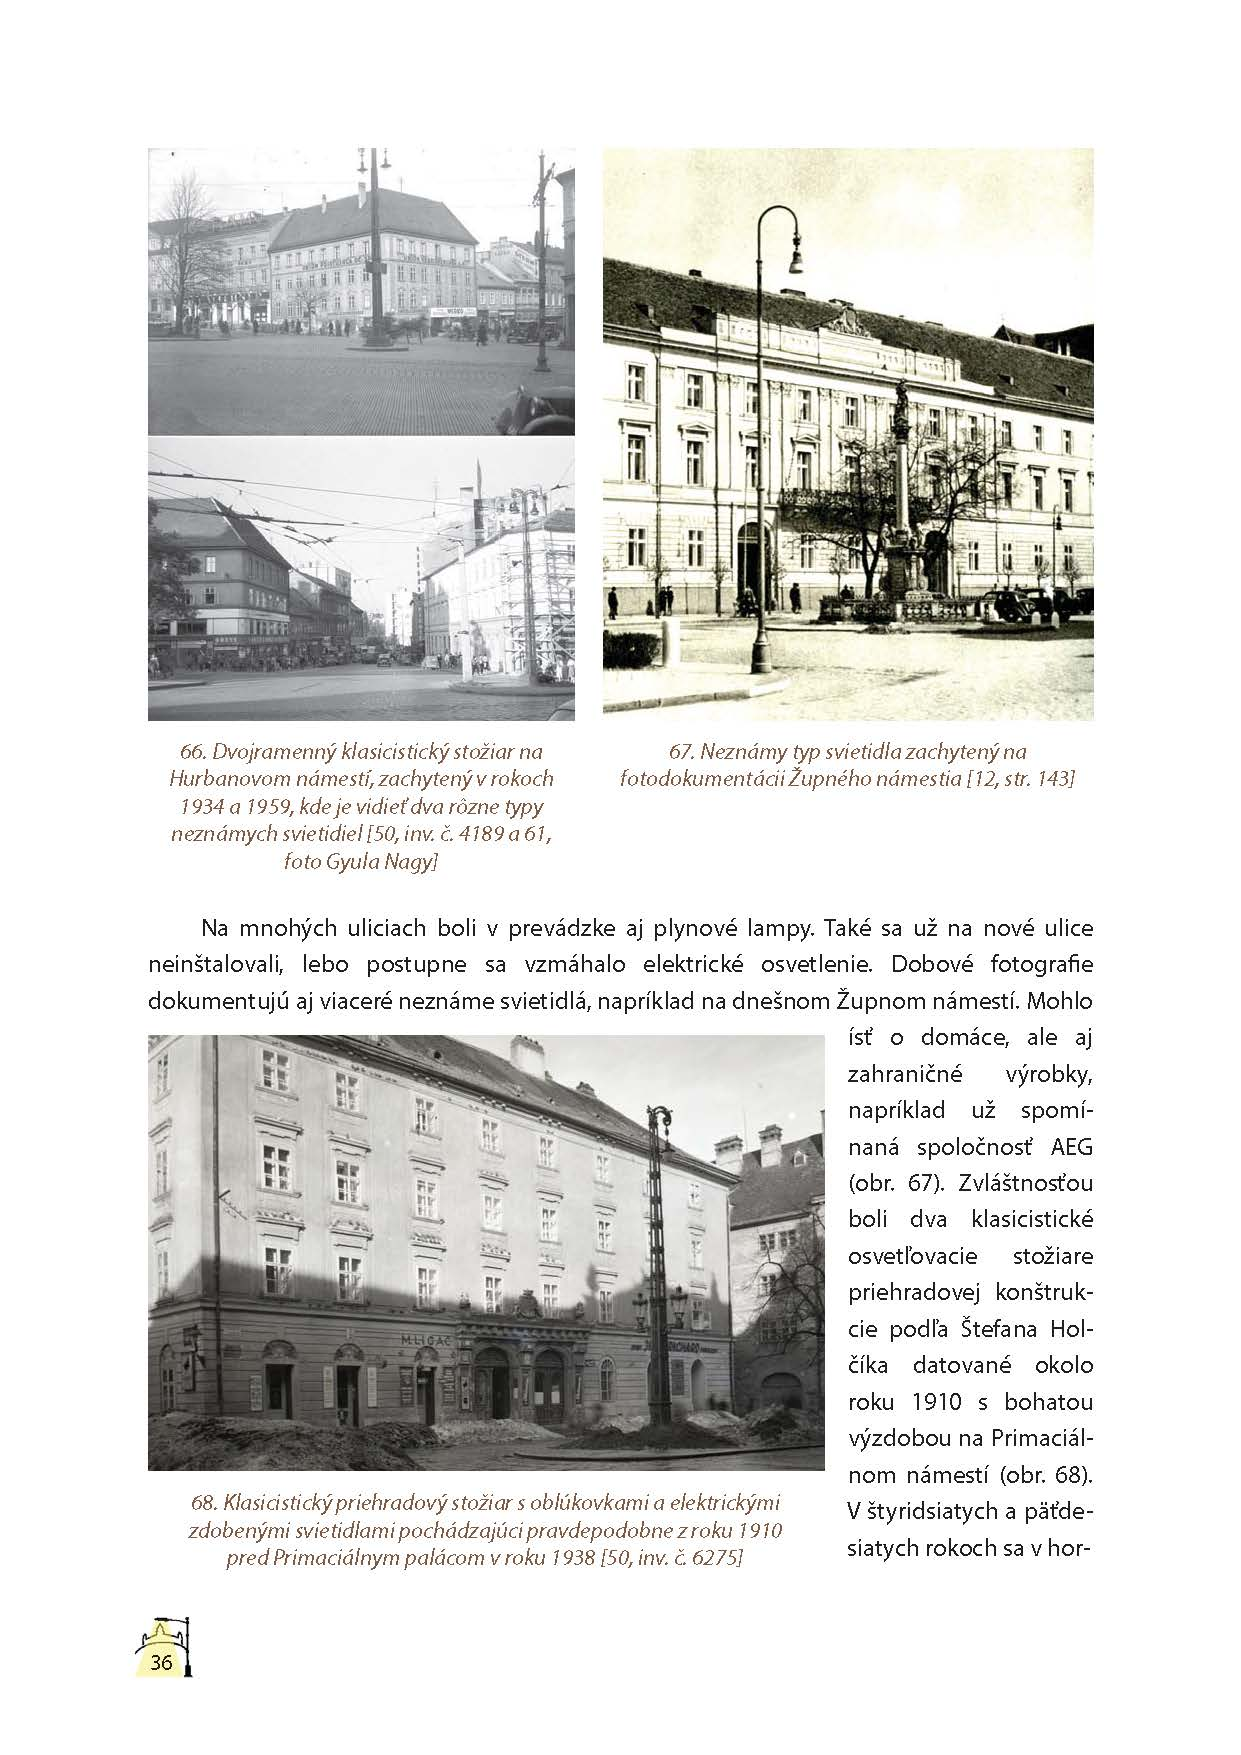 Lampy verejného osvetlenia v Bratislave 6